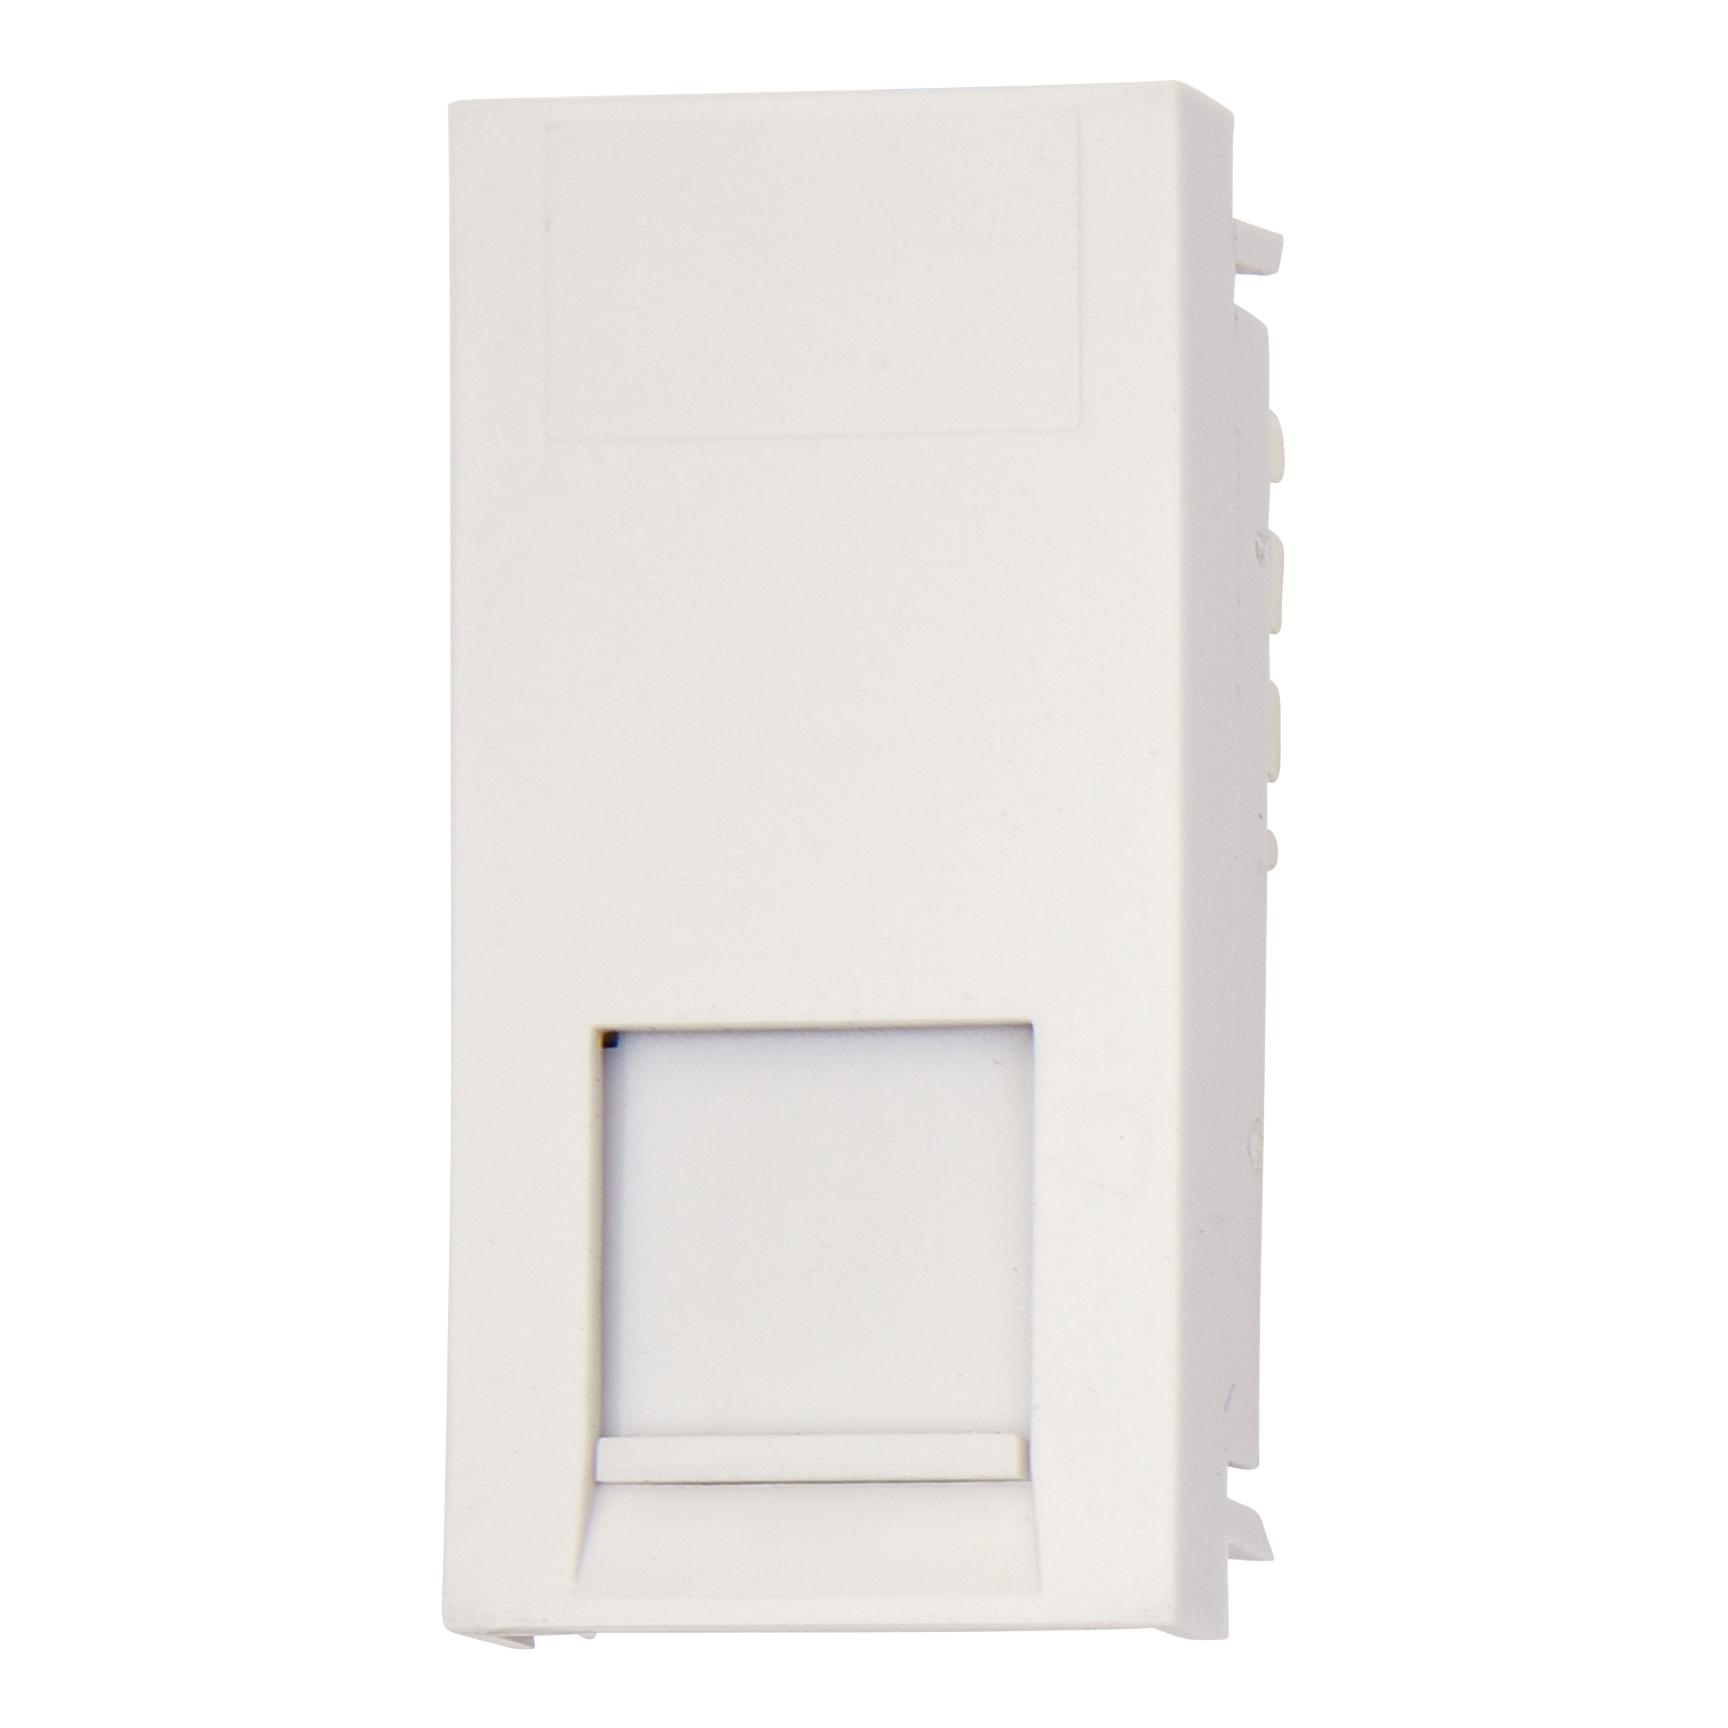 Deta RJ11 Telephone Module - White